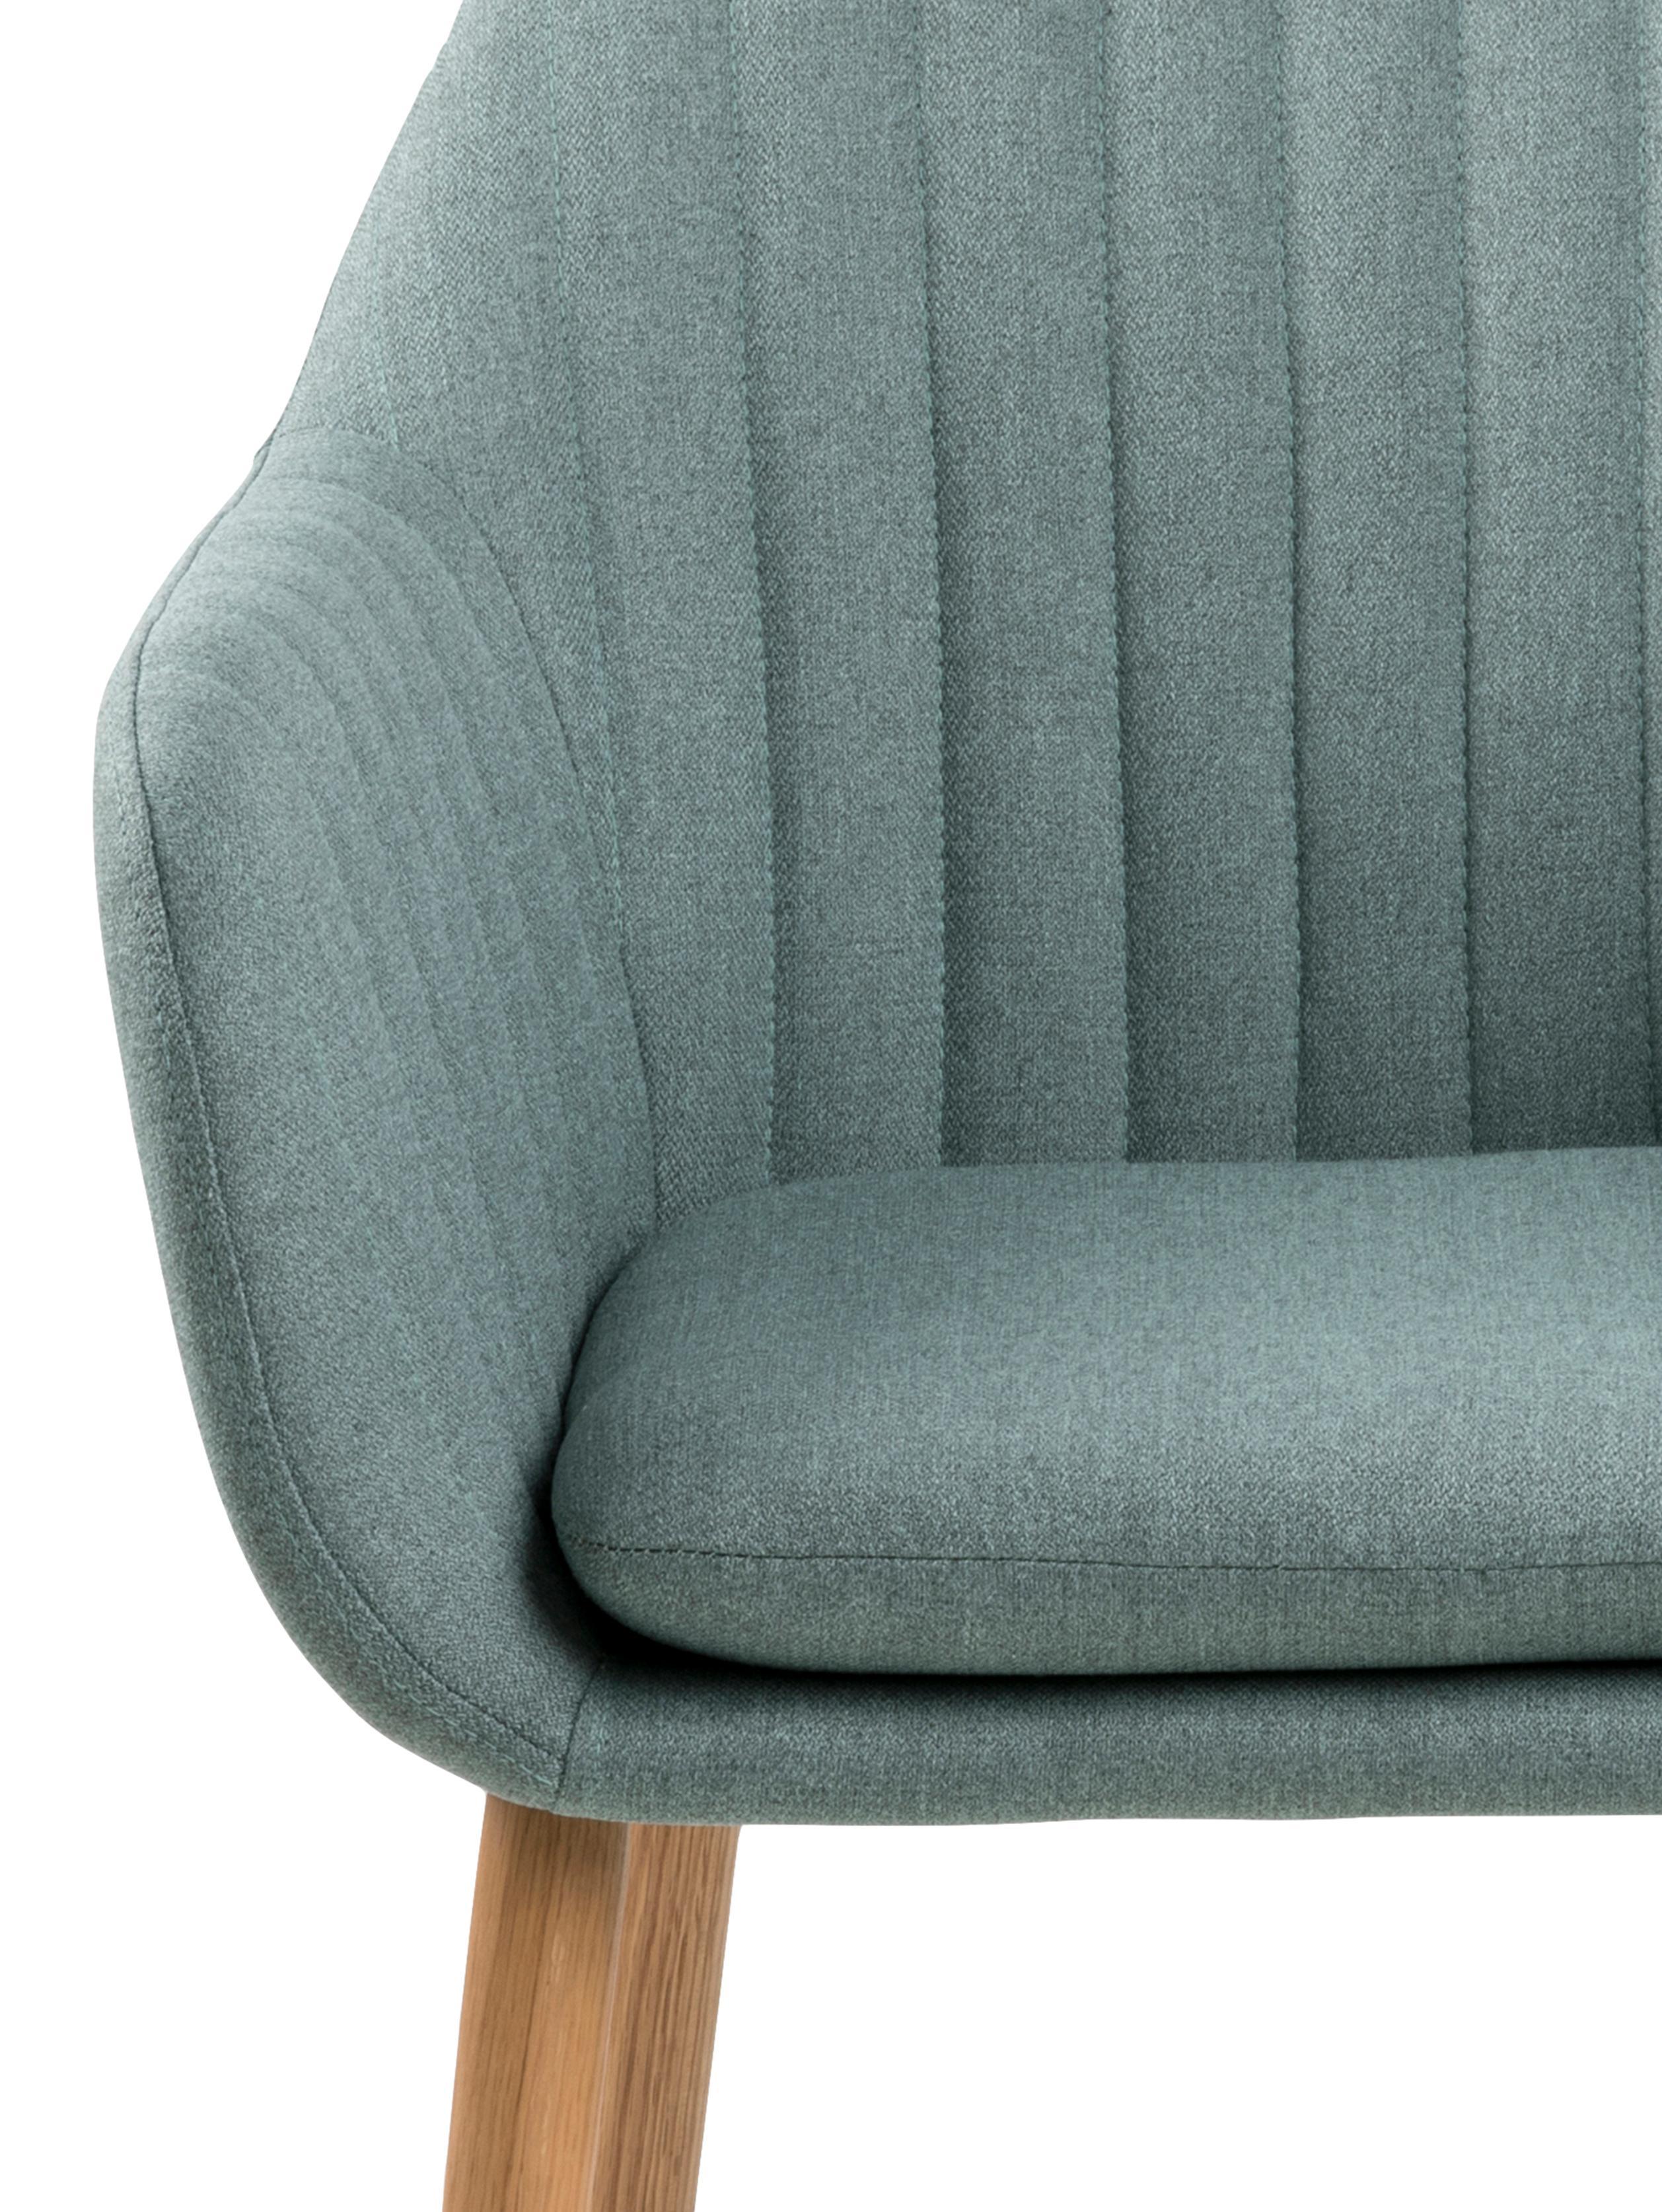 Silla con reposabrazos Emilia, Tapizado: poliéster, Patas: roble, aceitado El tapiza, Tejido verde oliva, patas roble, An 57 x F 59 cm